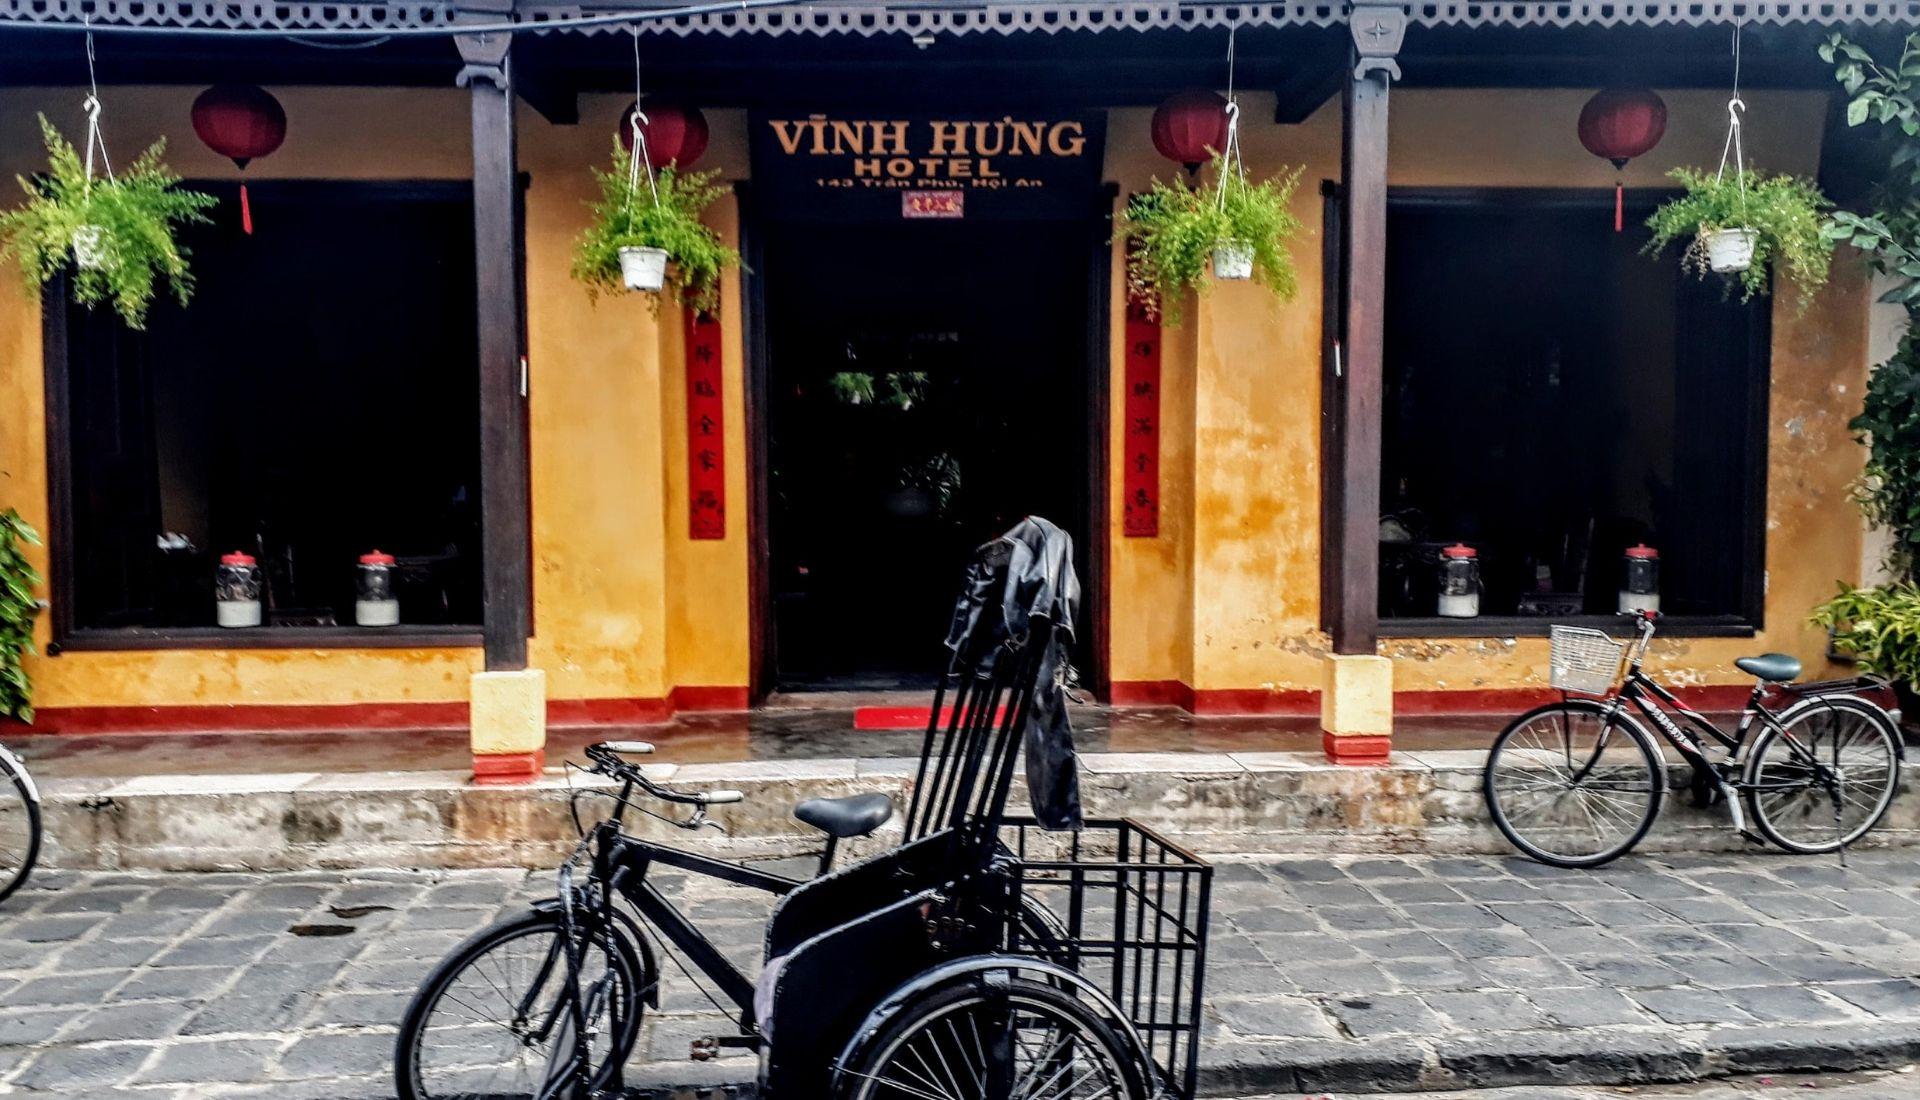 Ving Hung Hotel